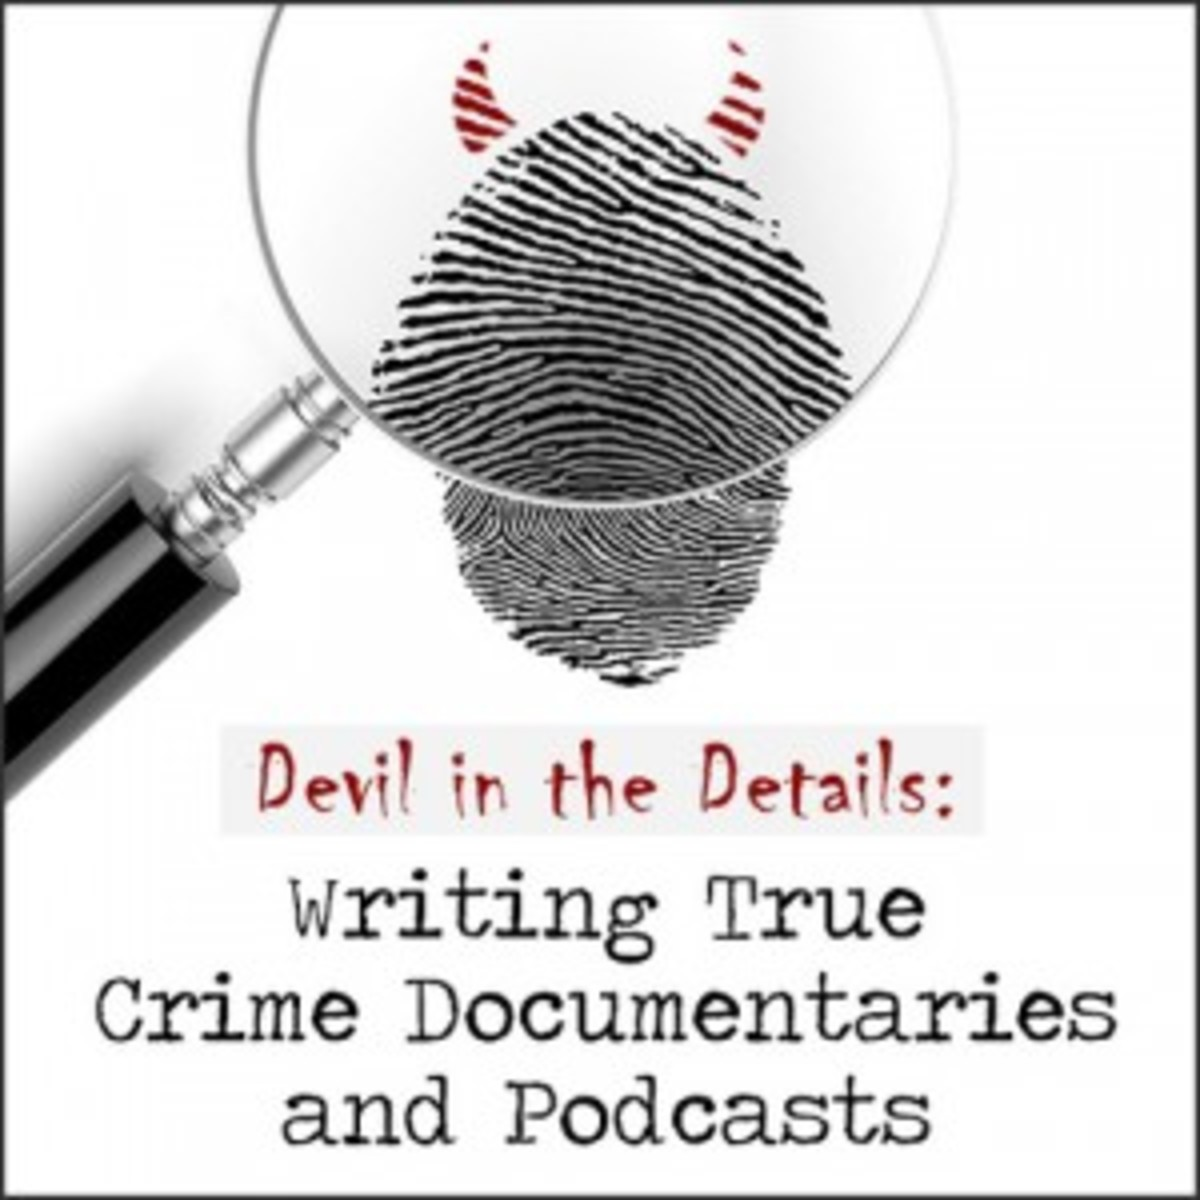 ws-devildetails-crimedocumentaries-500_medium